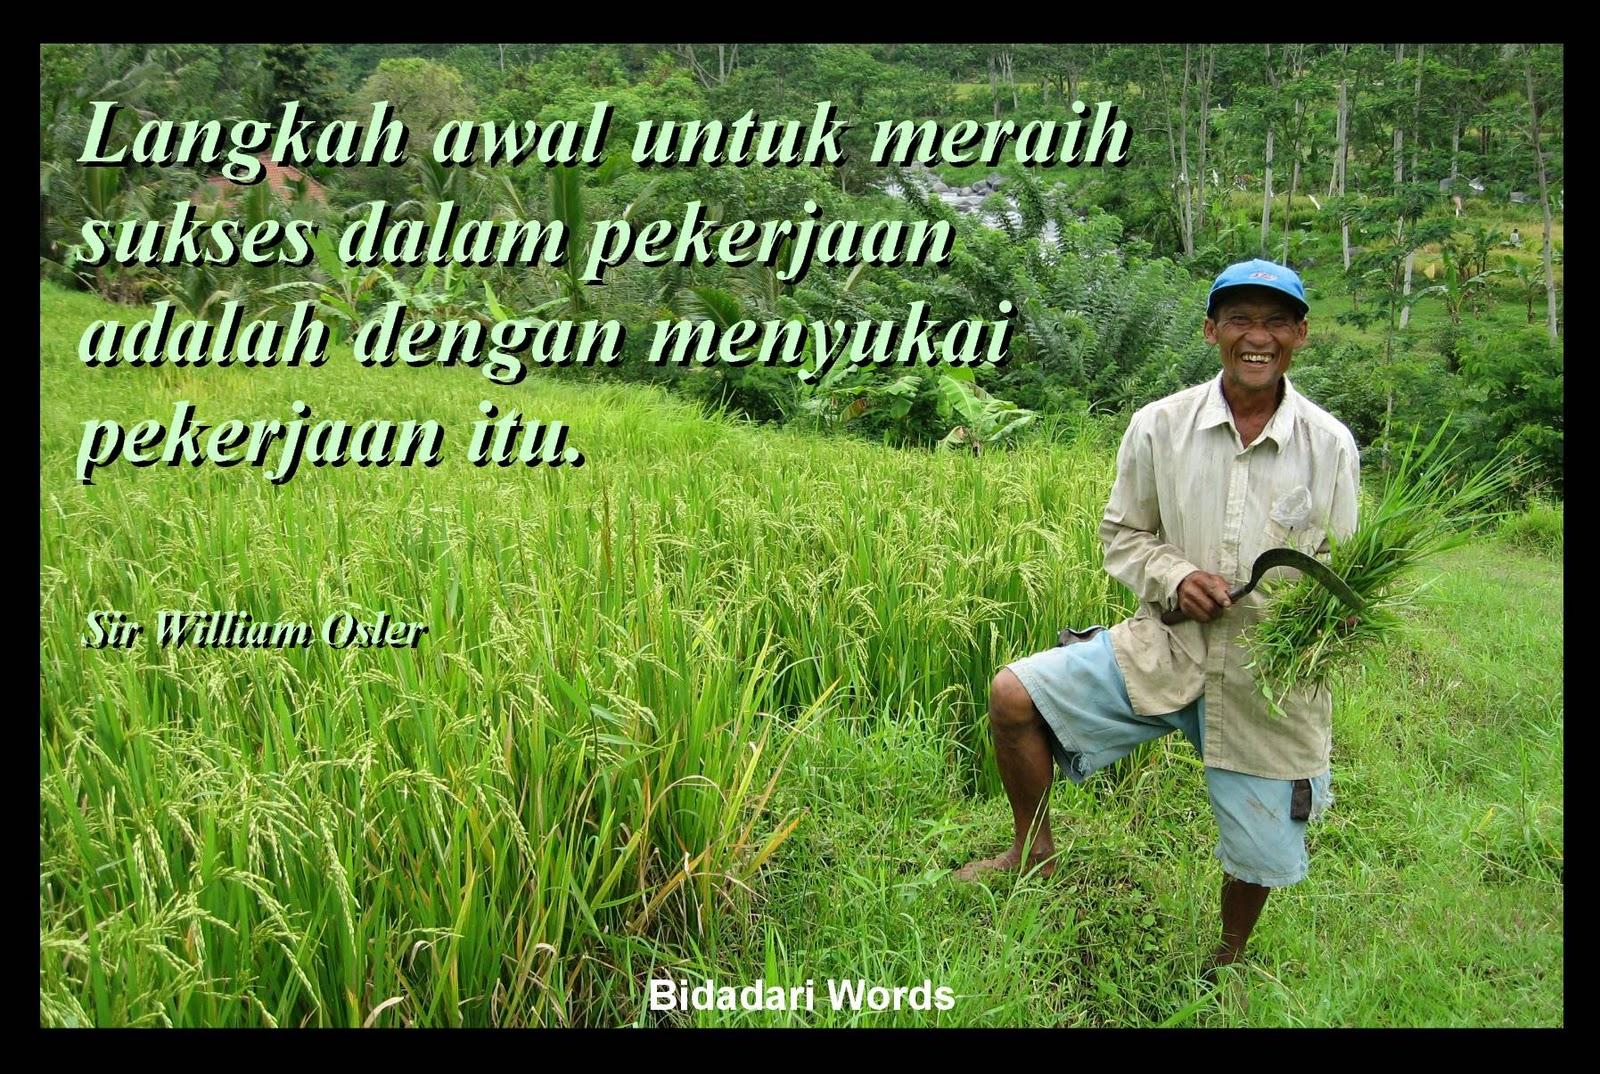 Kata Kata Sedih Anak Petani Cikimmcom